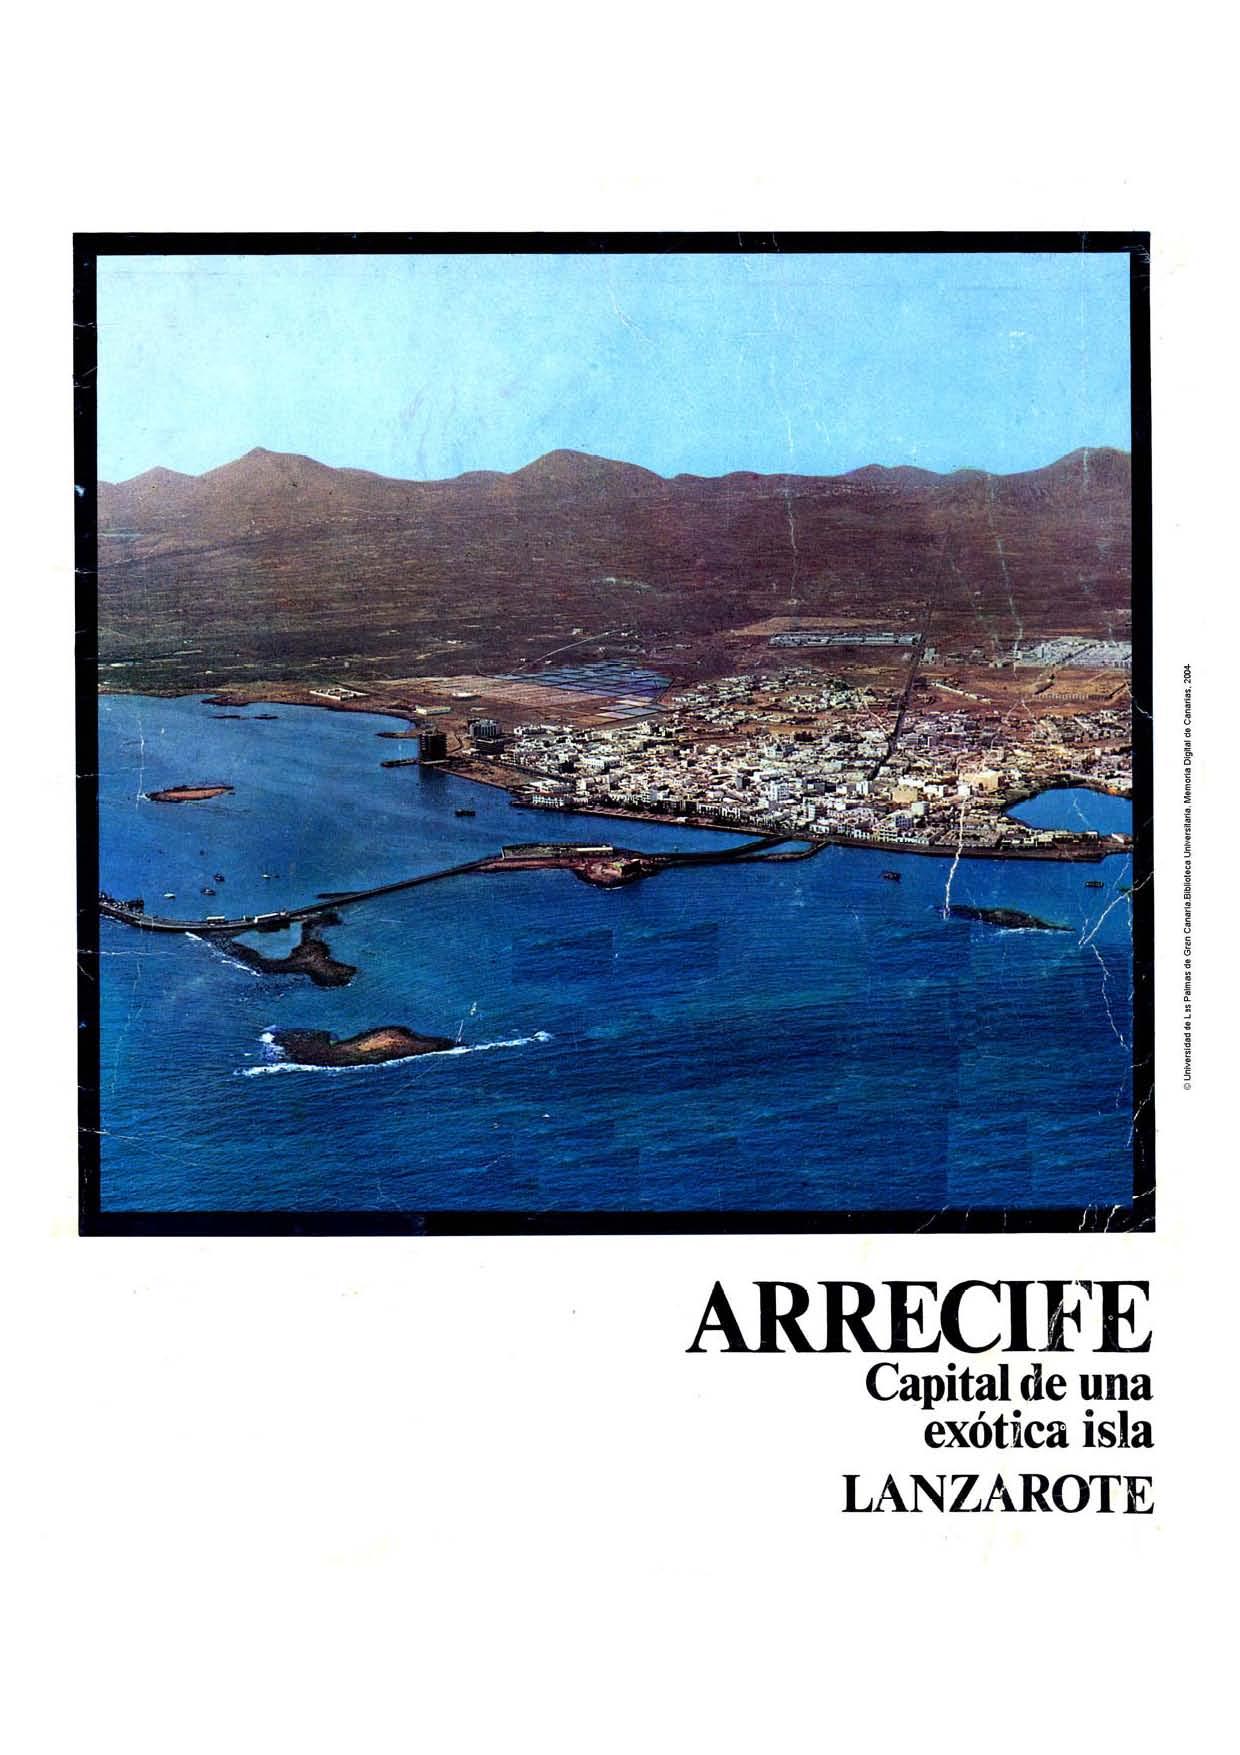 Arrecife, capital de una exótica isla (Fiestas de San Ginés 1970)